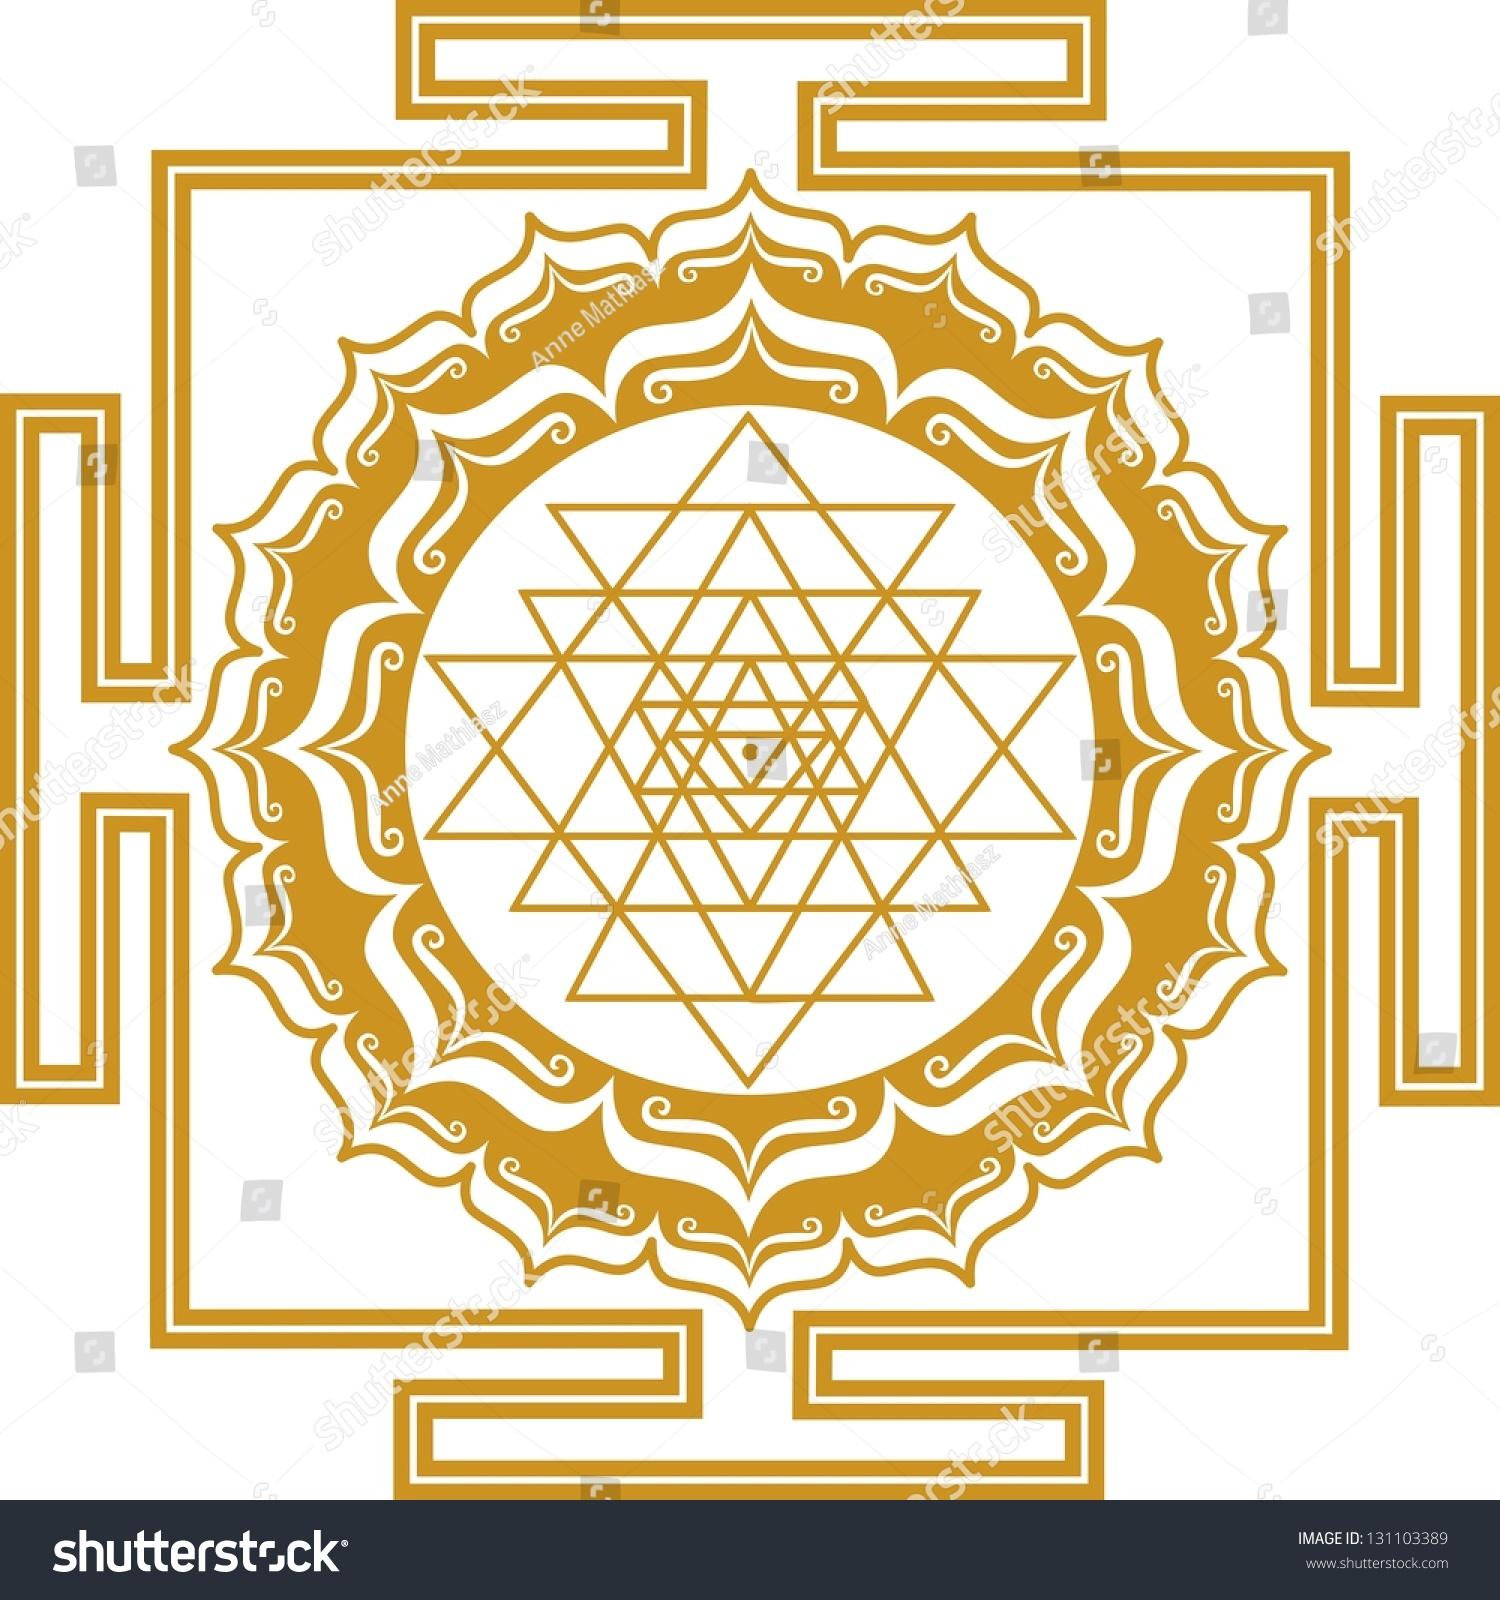 Sri Chakra Yantra, Chakra Yantra, Shri Chakra Yantra